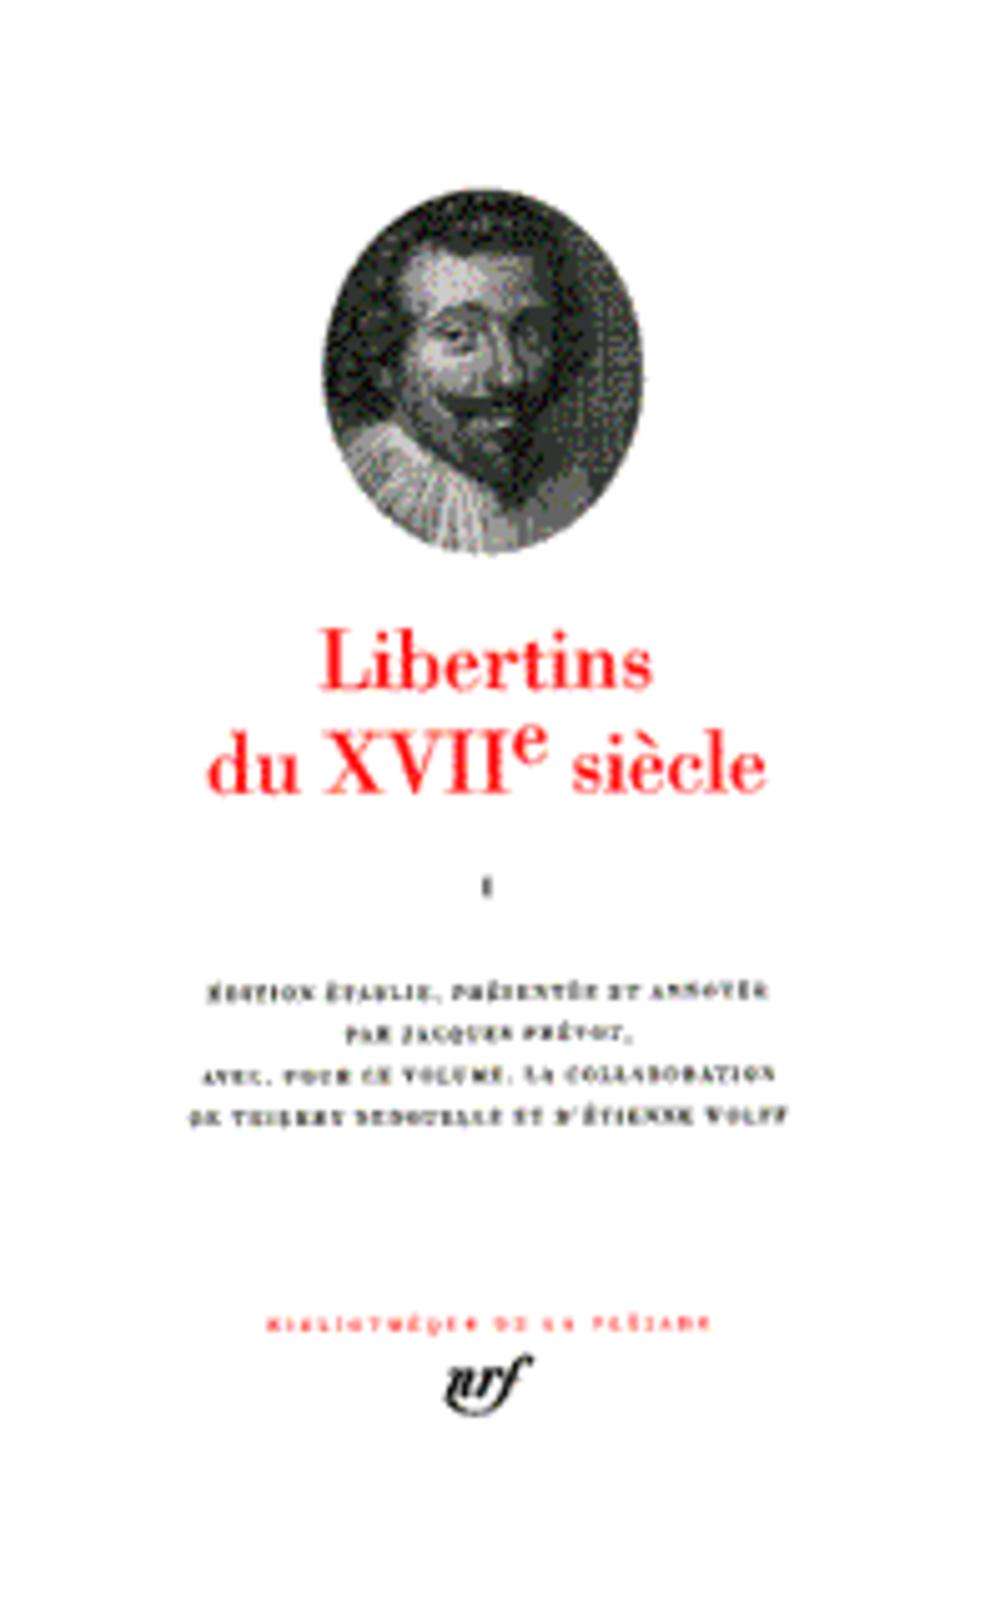 COLLECTIF - LIBERTINS DU XVII SIECLE T.1